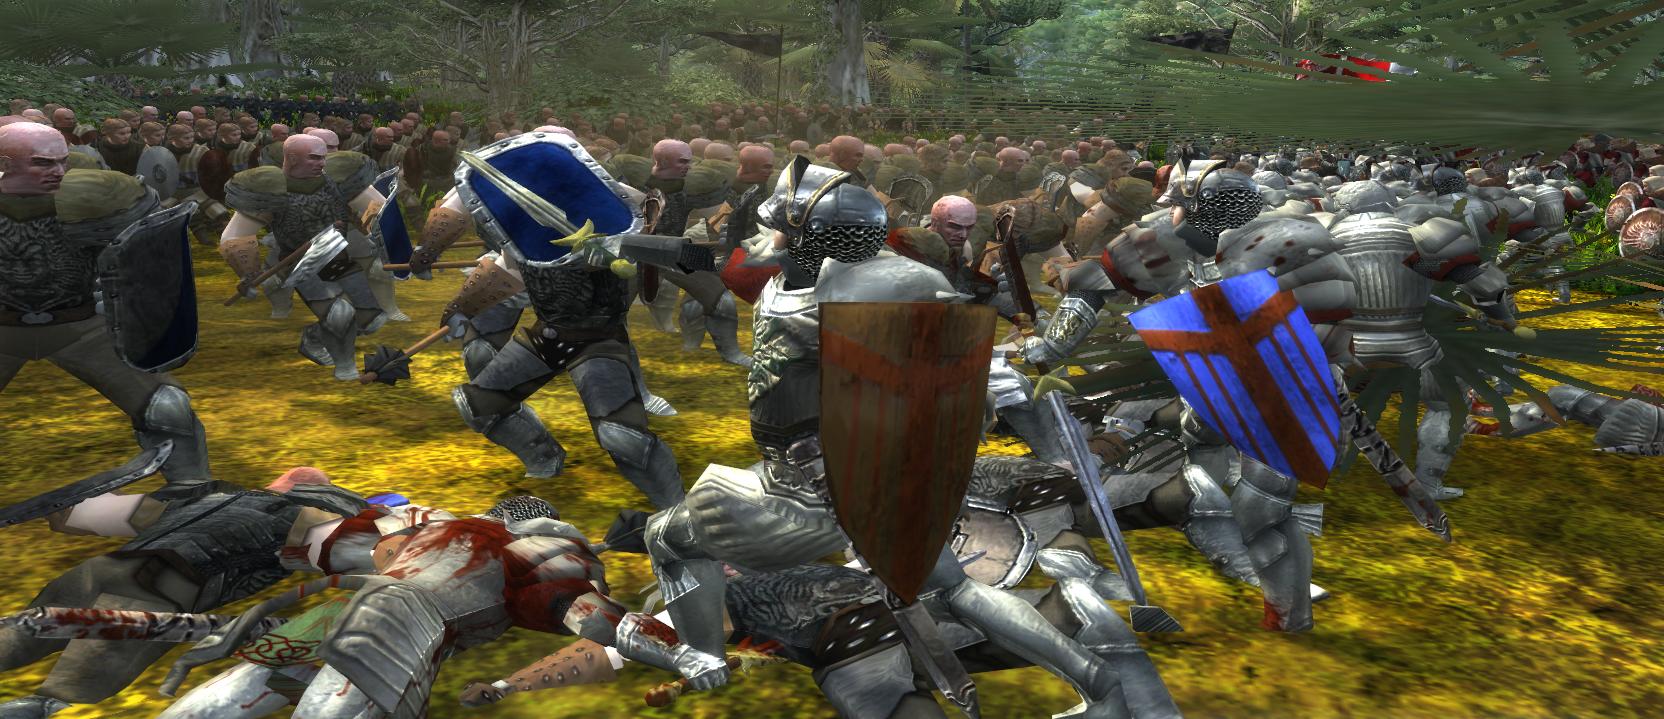 Gothic Total War - Página 3 Pic3vrs3